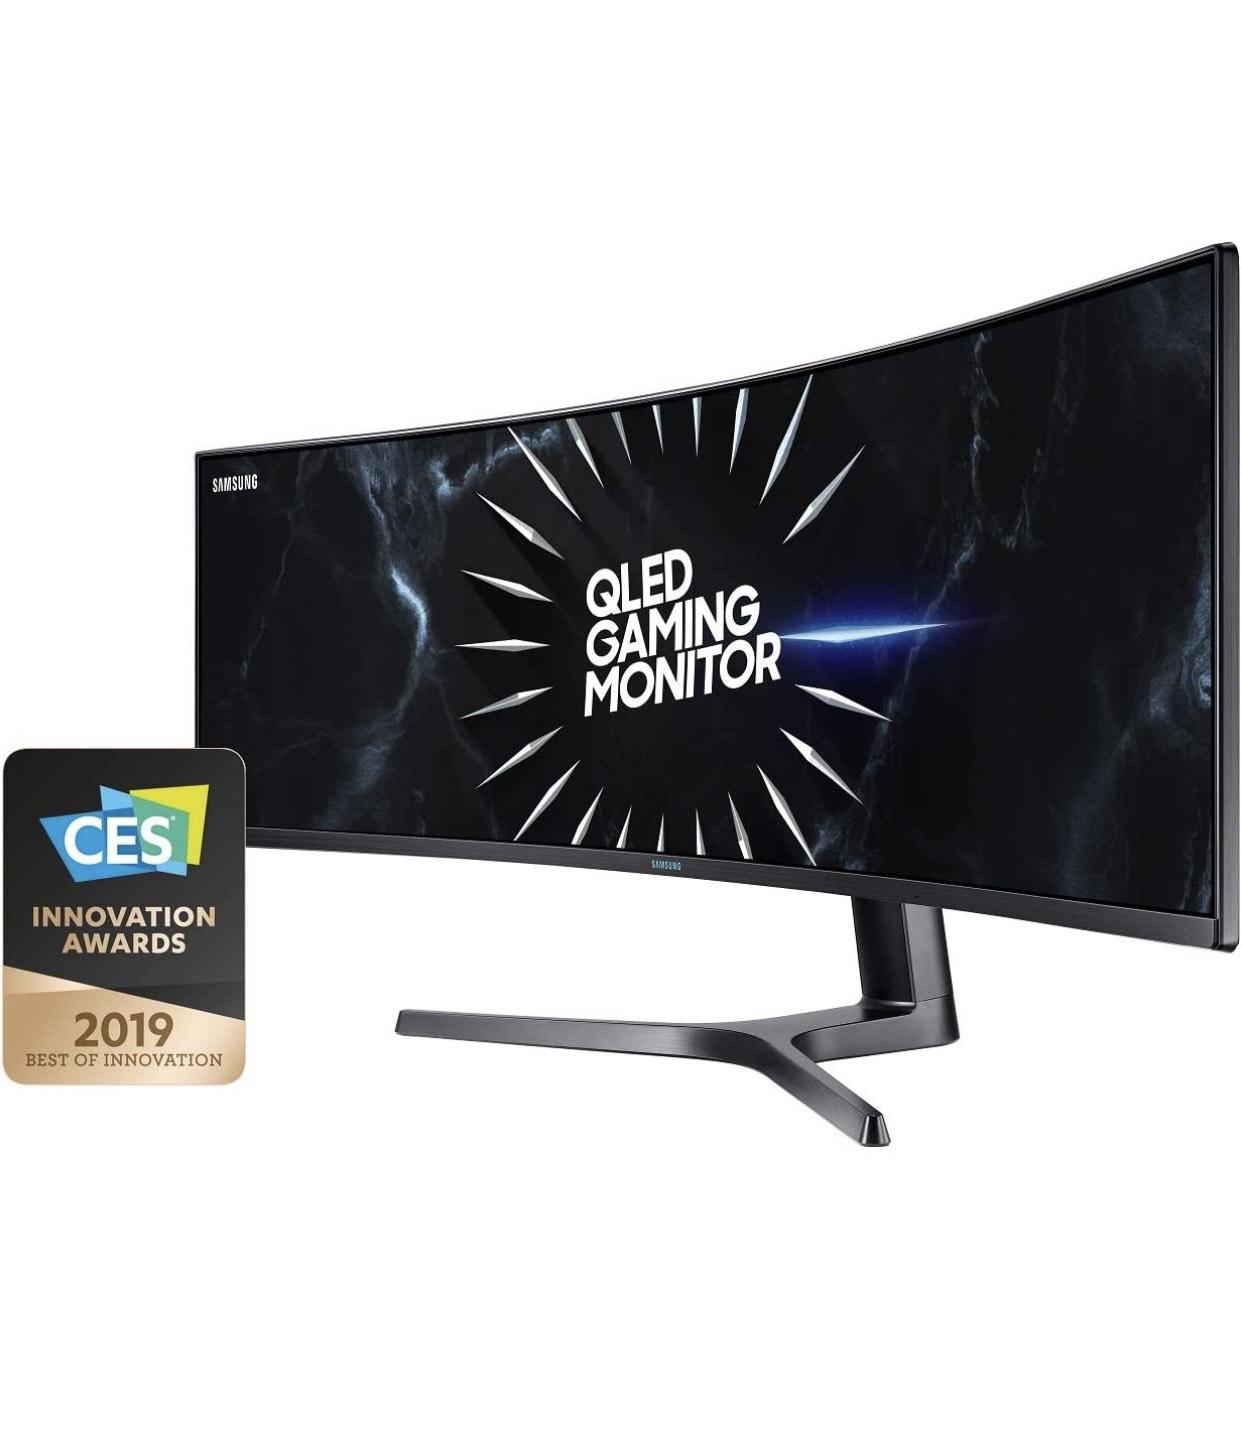 "QLED Gaming Monitor Samsung C49RG94SSU (49"") - Amazon Warehouse Deals FR"